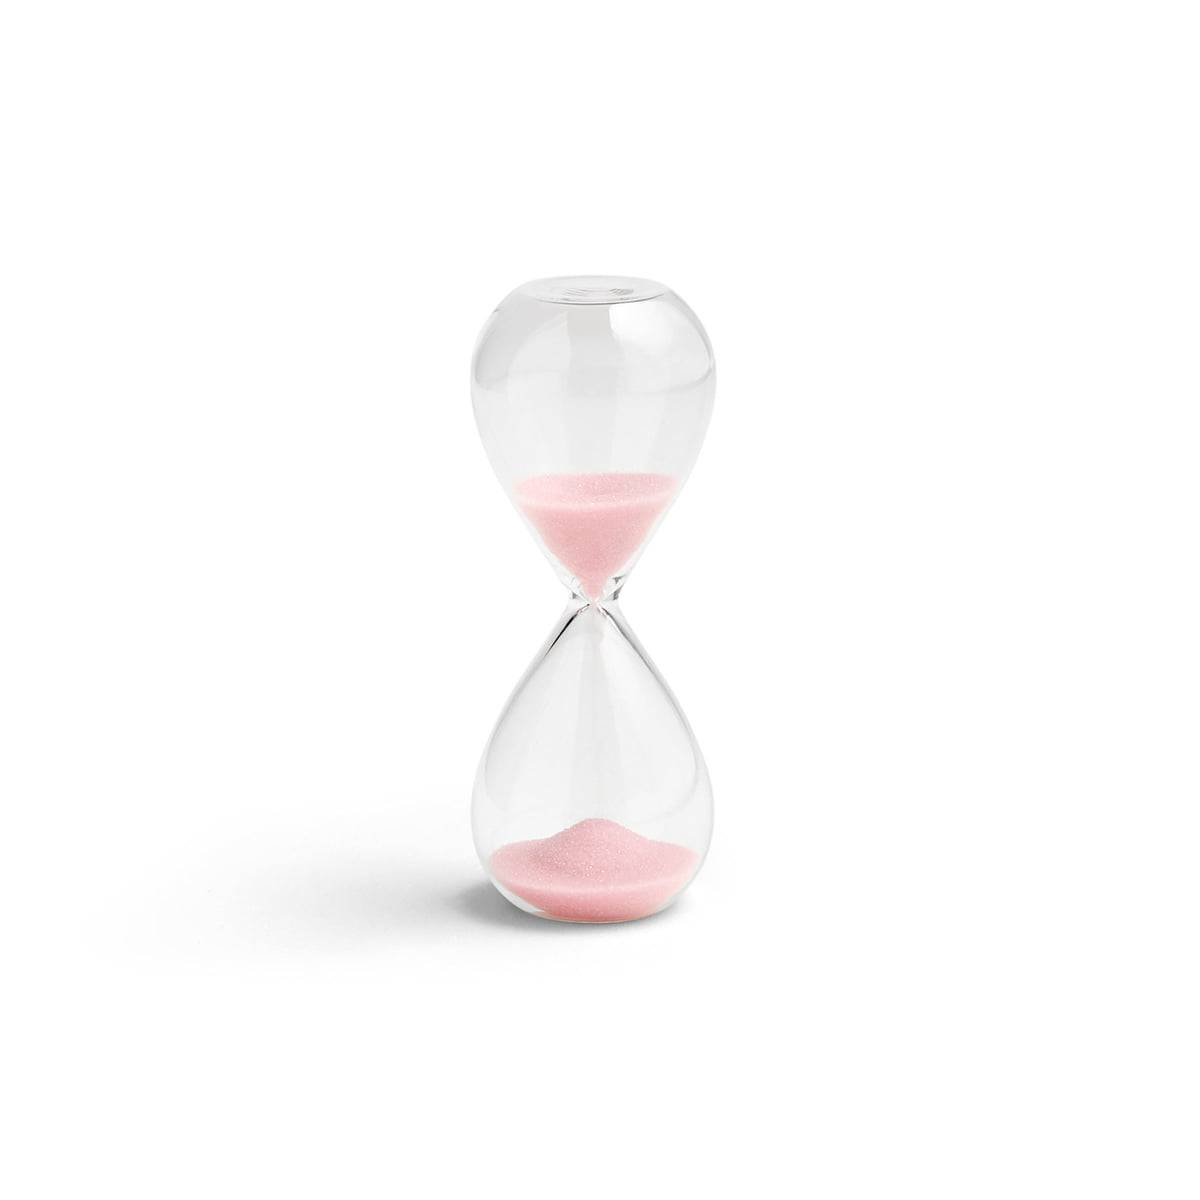 HAY - Time Sanduhr S, light pink (2019)